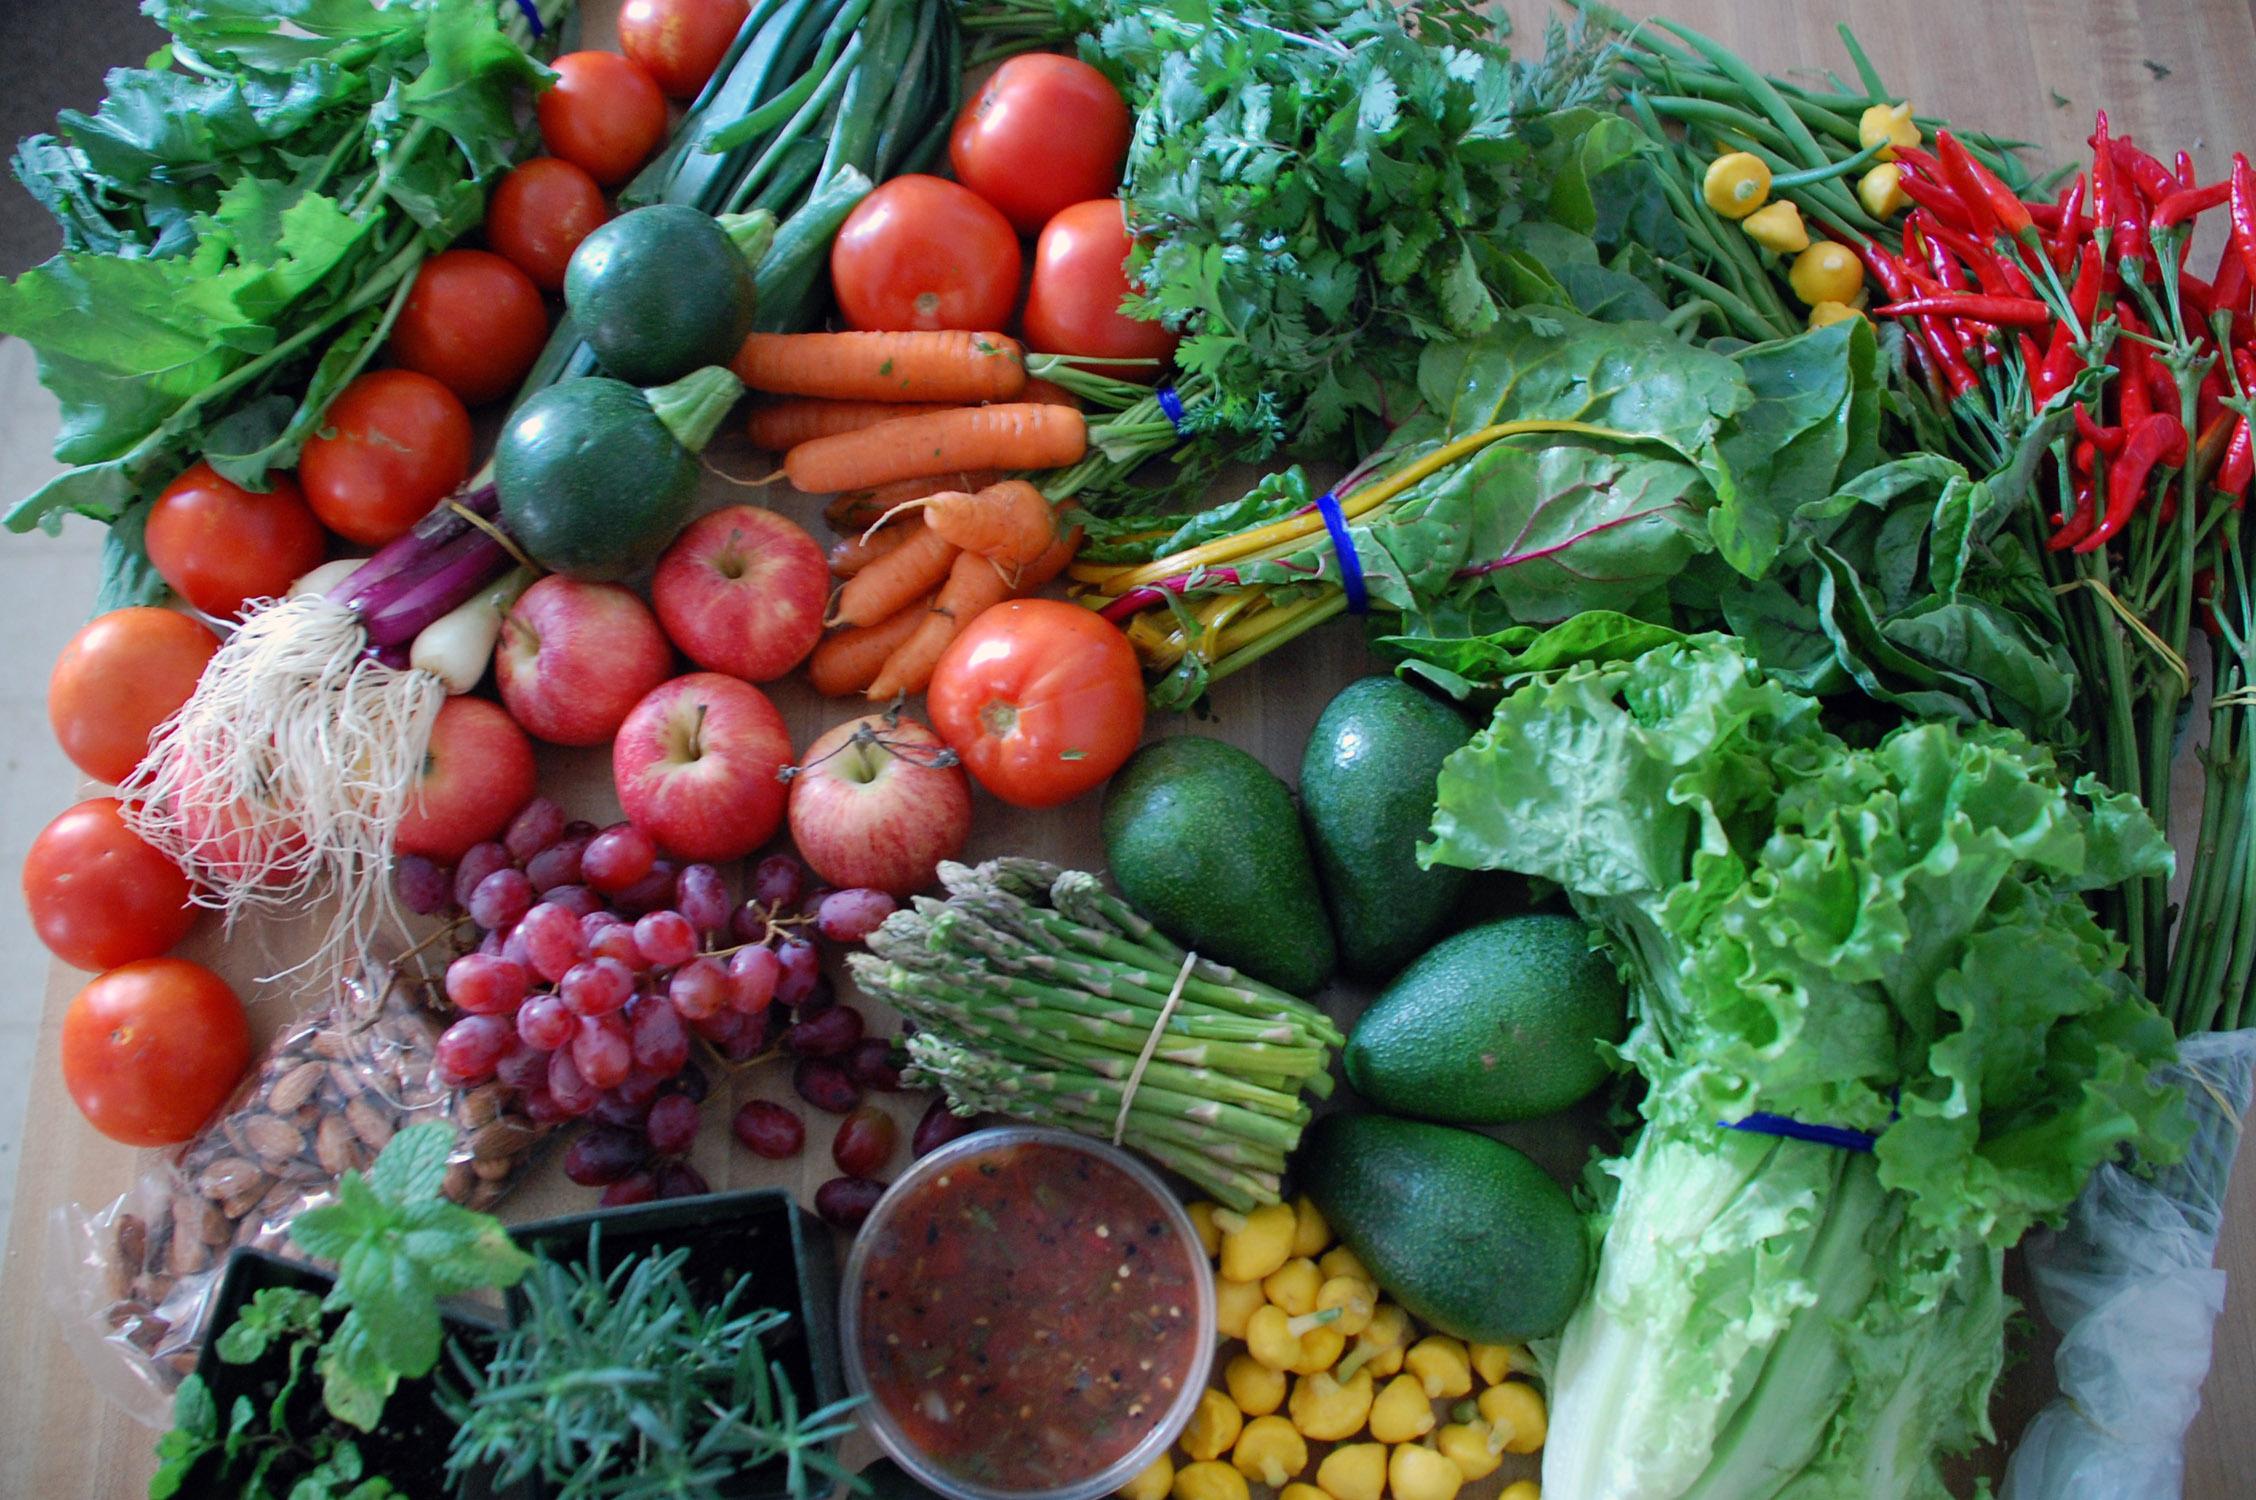 Using Your Garden To Eat Smart Choosing Your Veggies